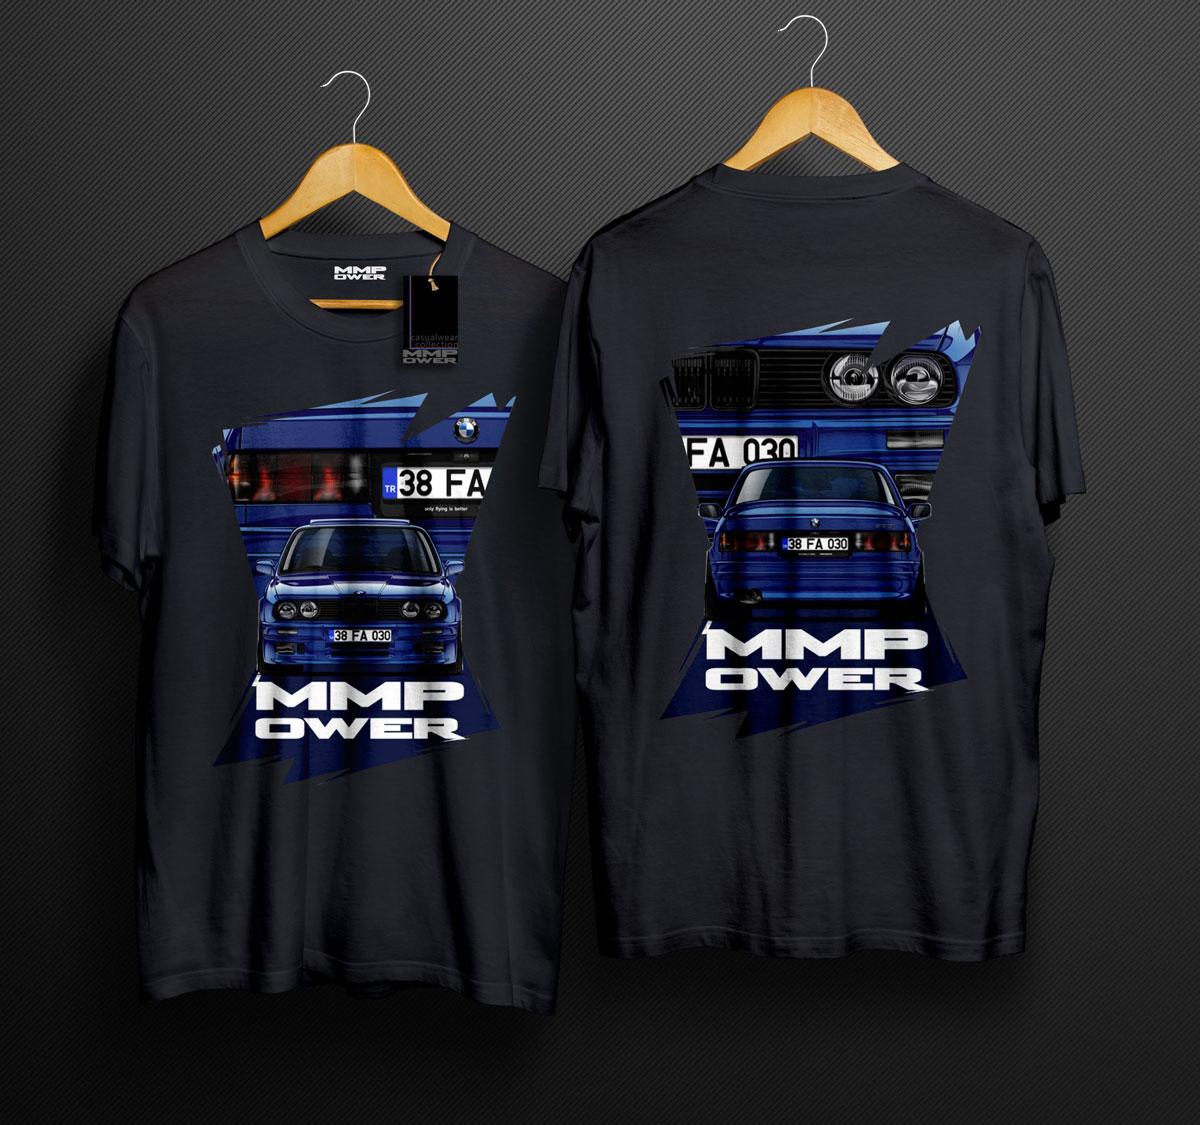 MMPower E30 Karekter TShirt Siyah